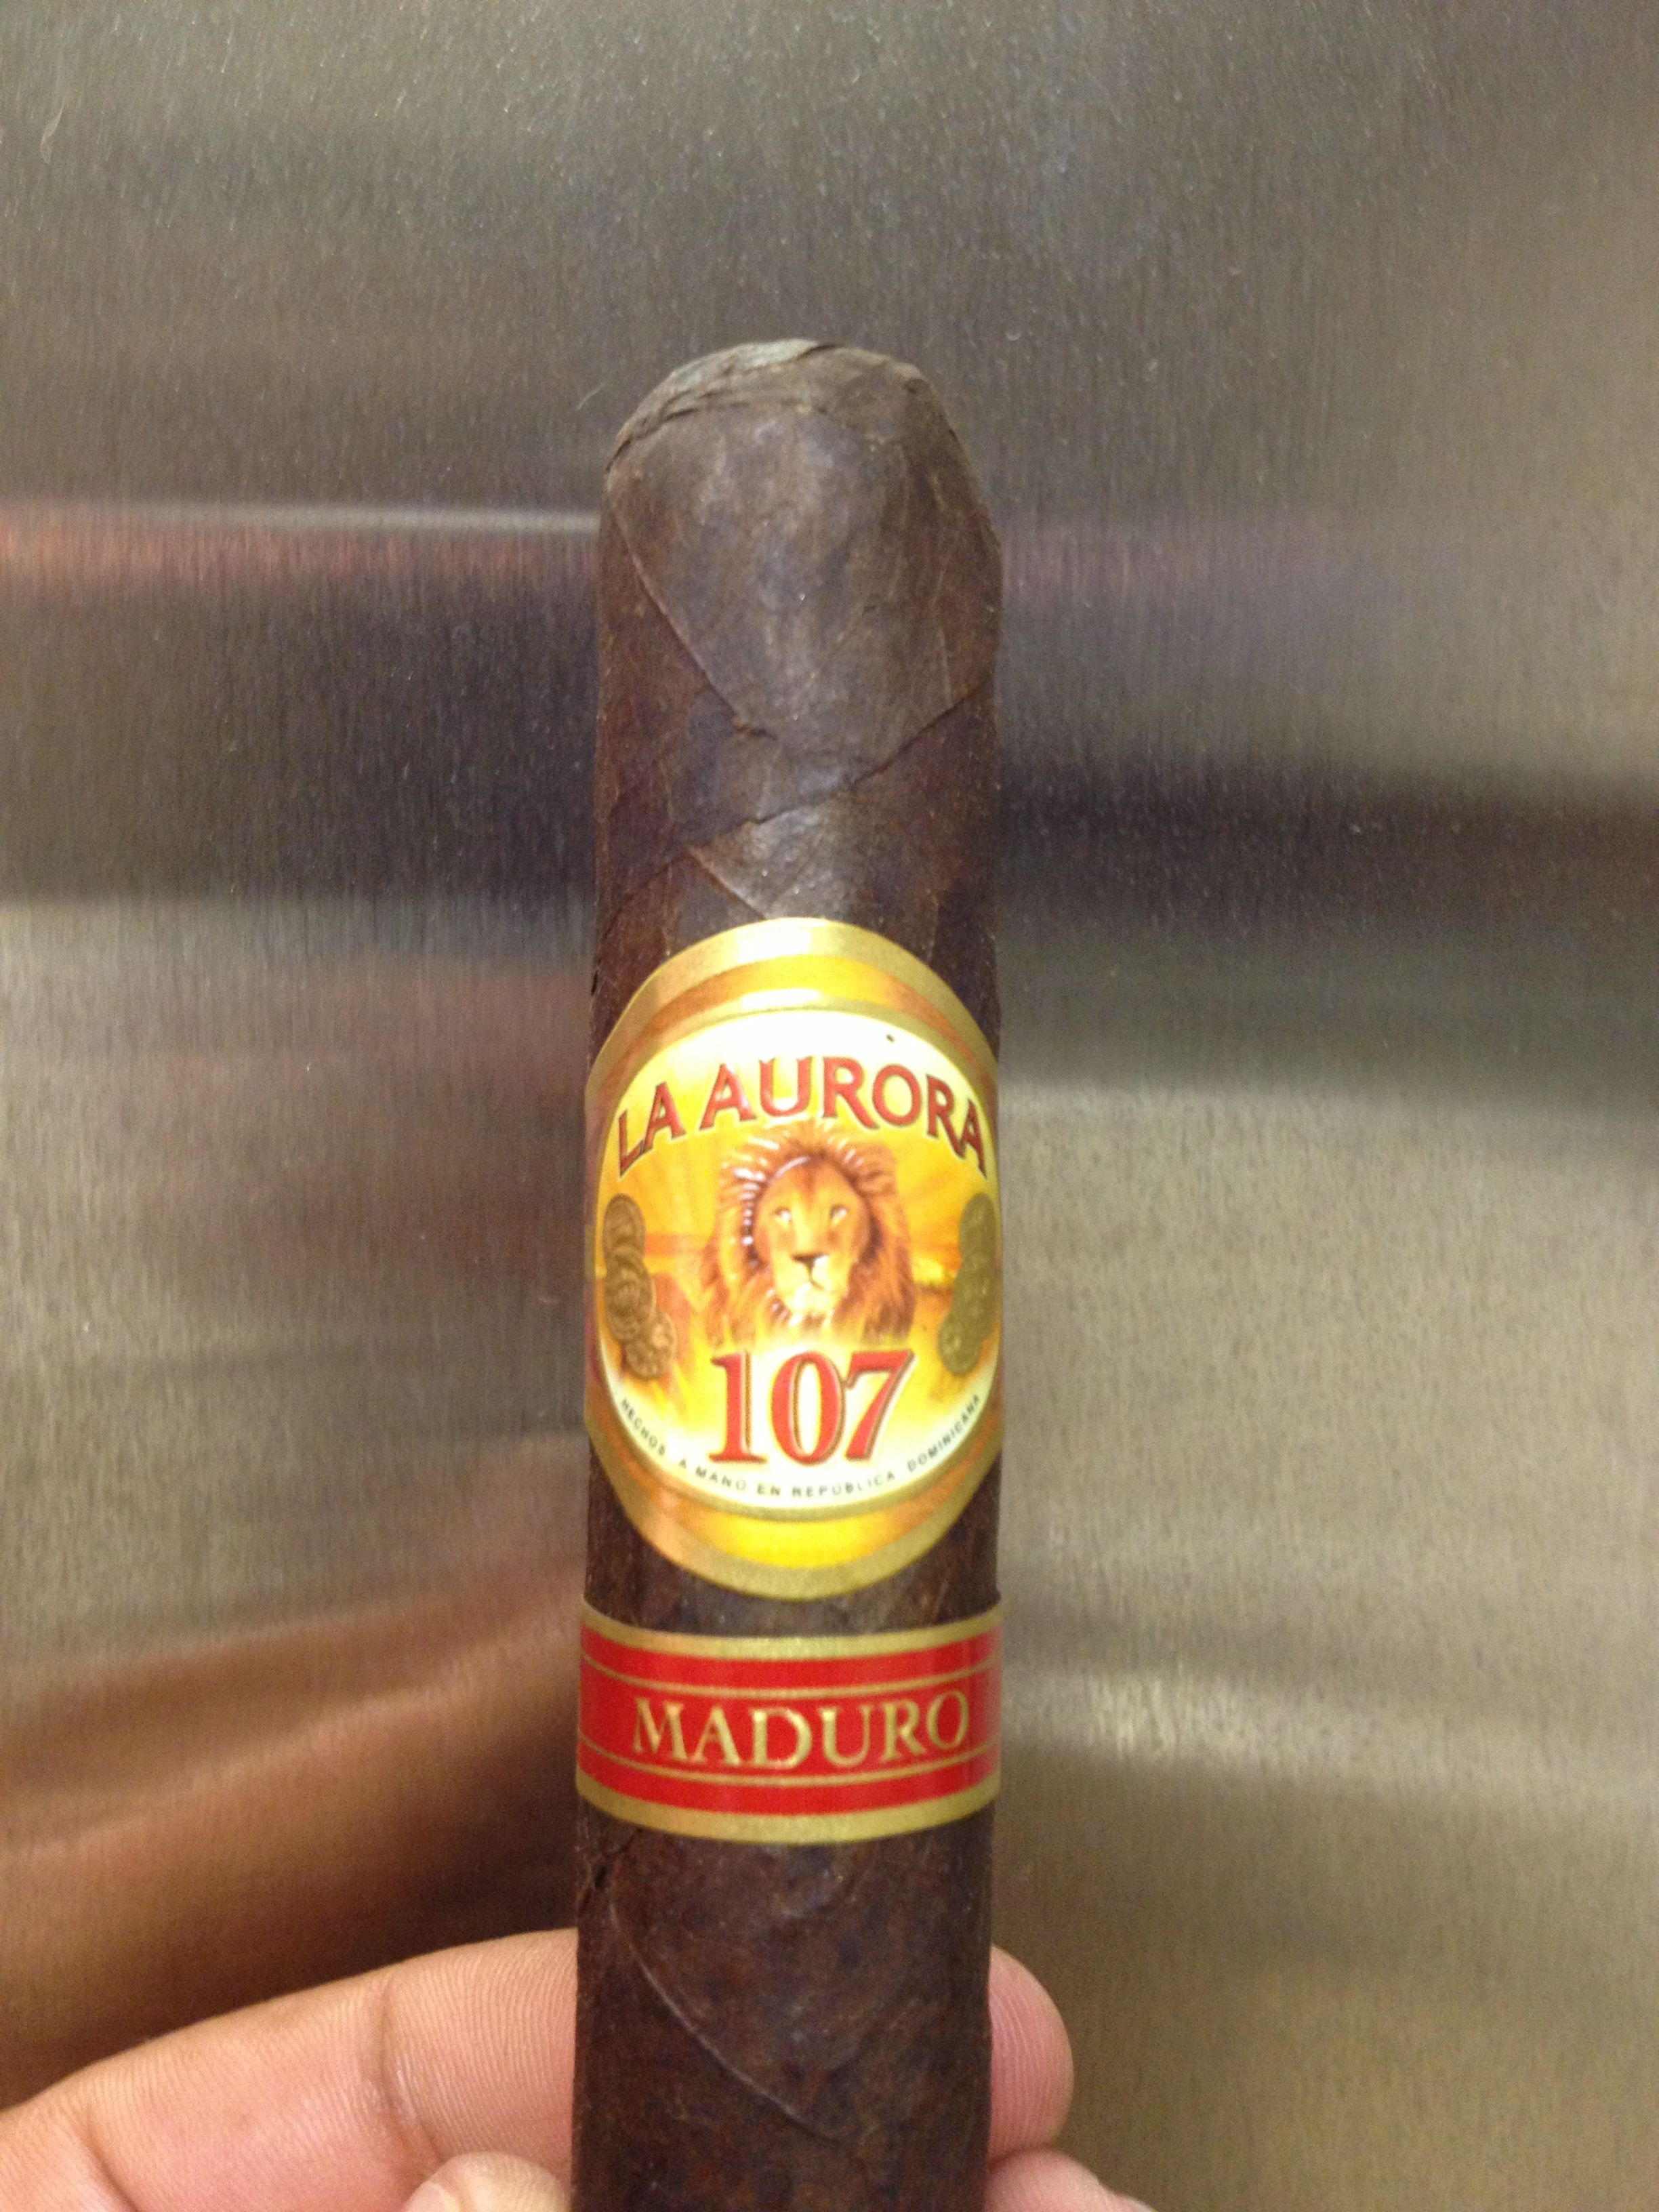 Enjoyed this La Aurora 107 Maduro.